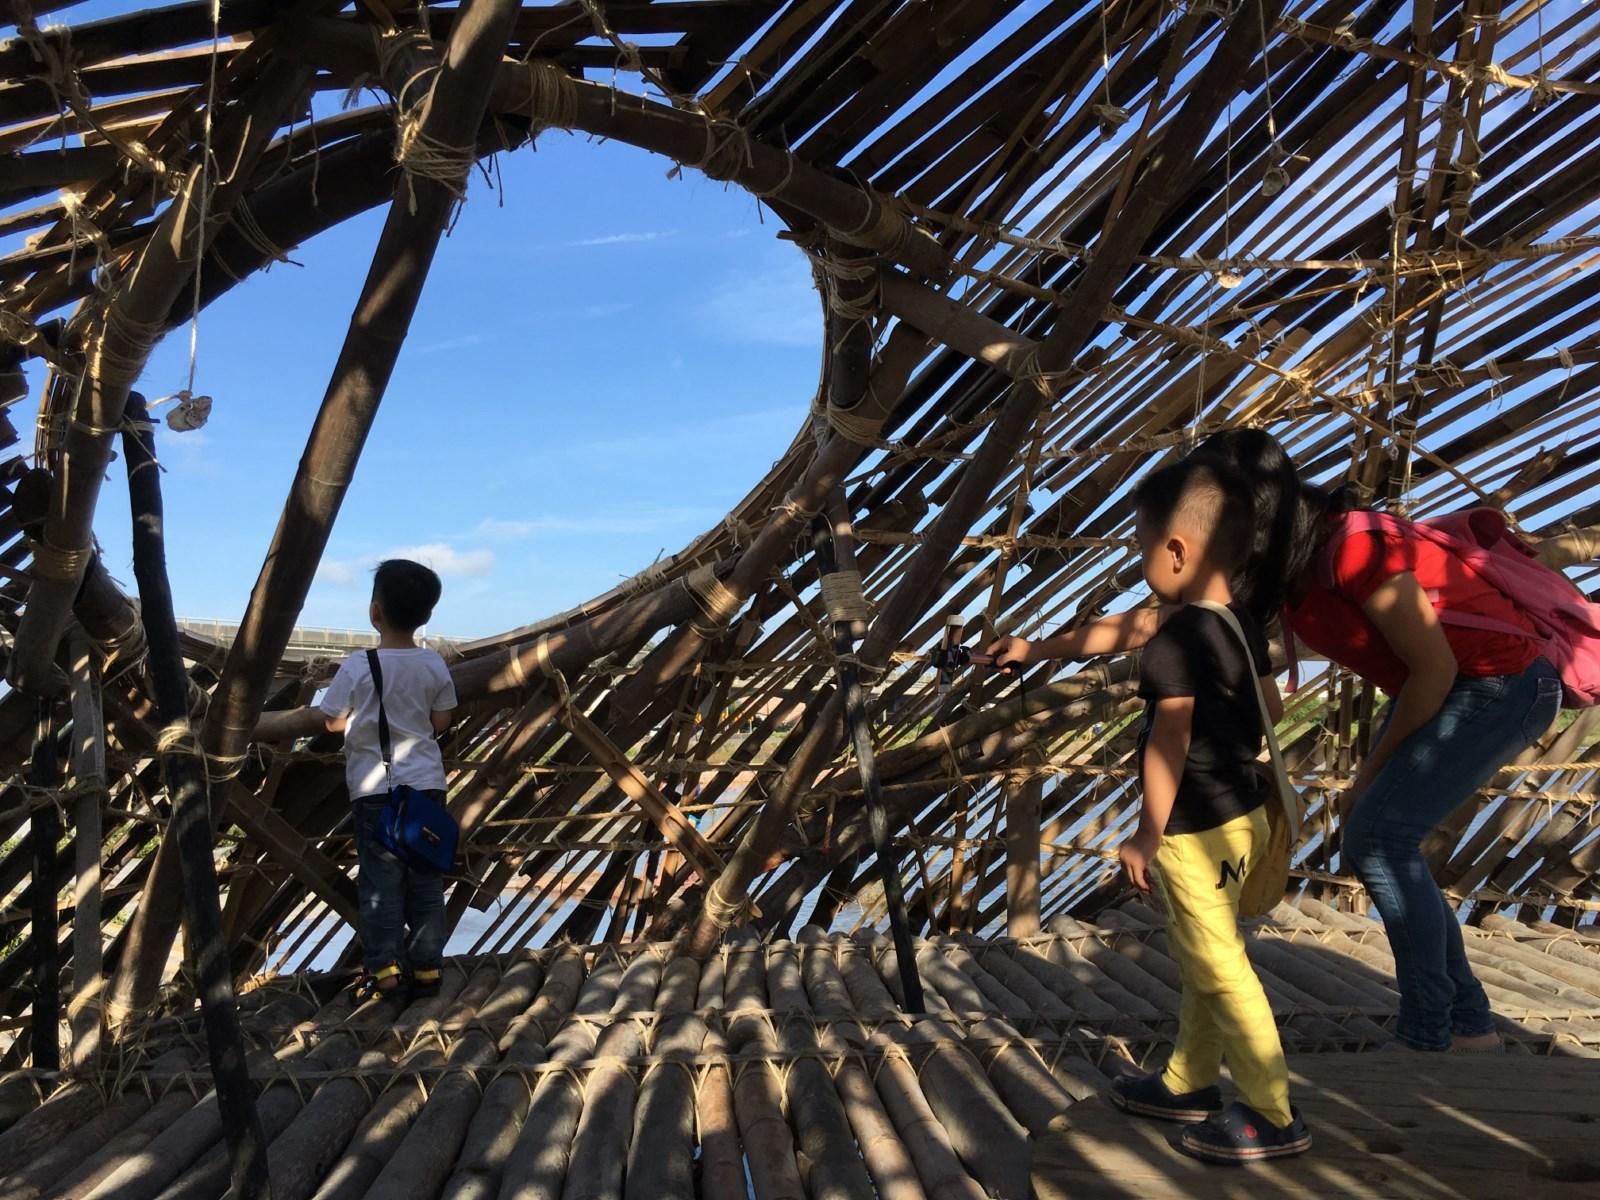 Chenglong shelter 14 [1600x1200]